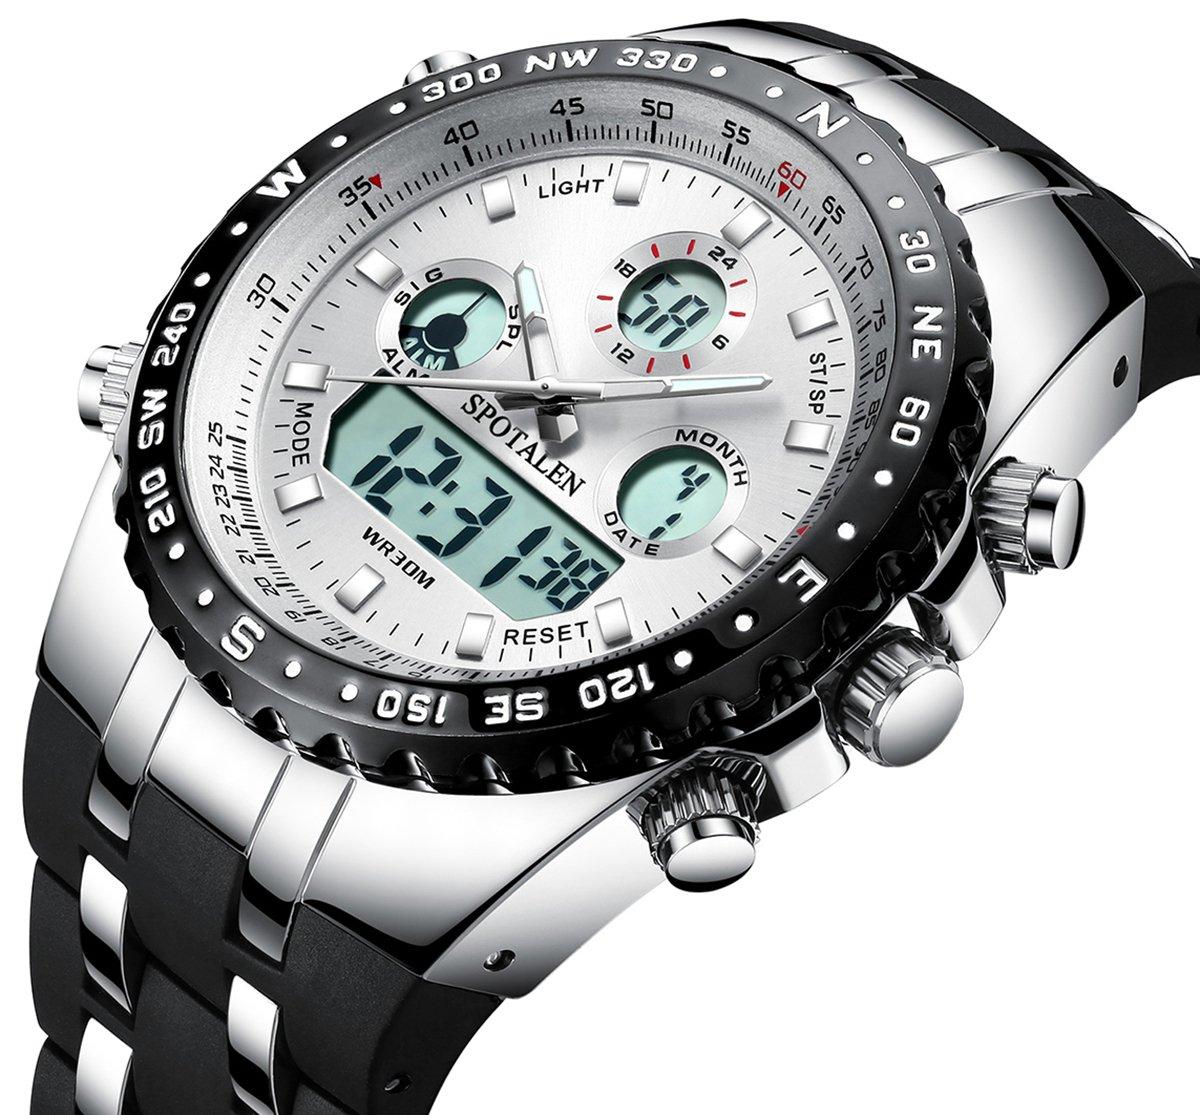 Herren-Sportuhren-Big-Face-Outdoor-Military-Digital-Armbanduhr-Wasserdicht-Hintergrundbeleuchtung-Chronograph-Uhren-fr-Mnner-Wei